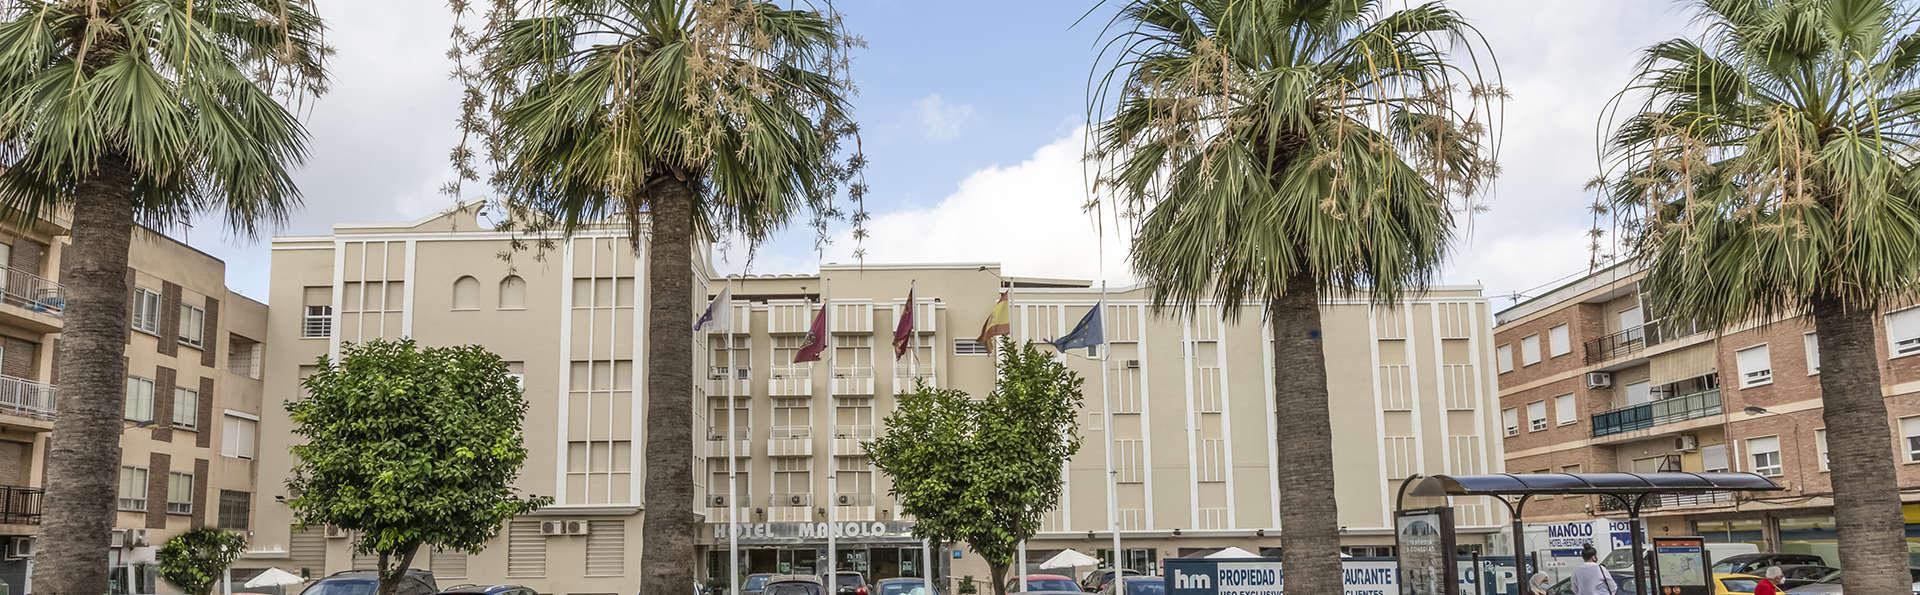 Hotel Manolo - EDIT_FRONT.jpg